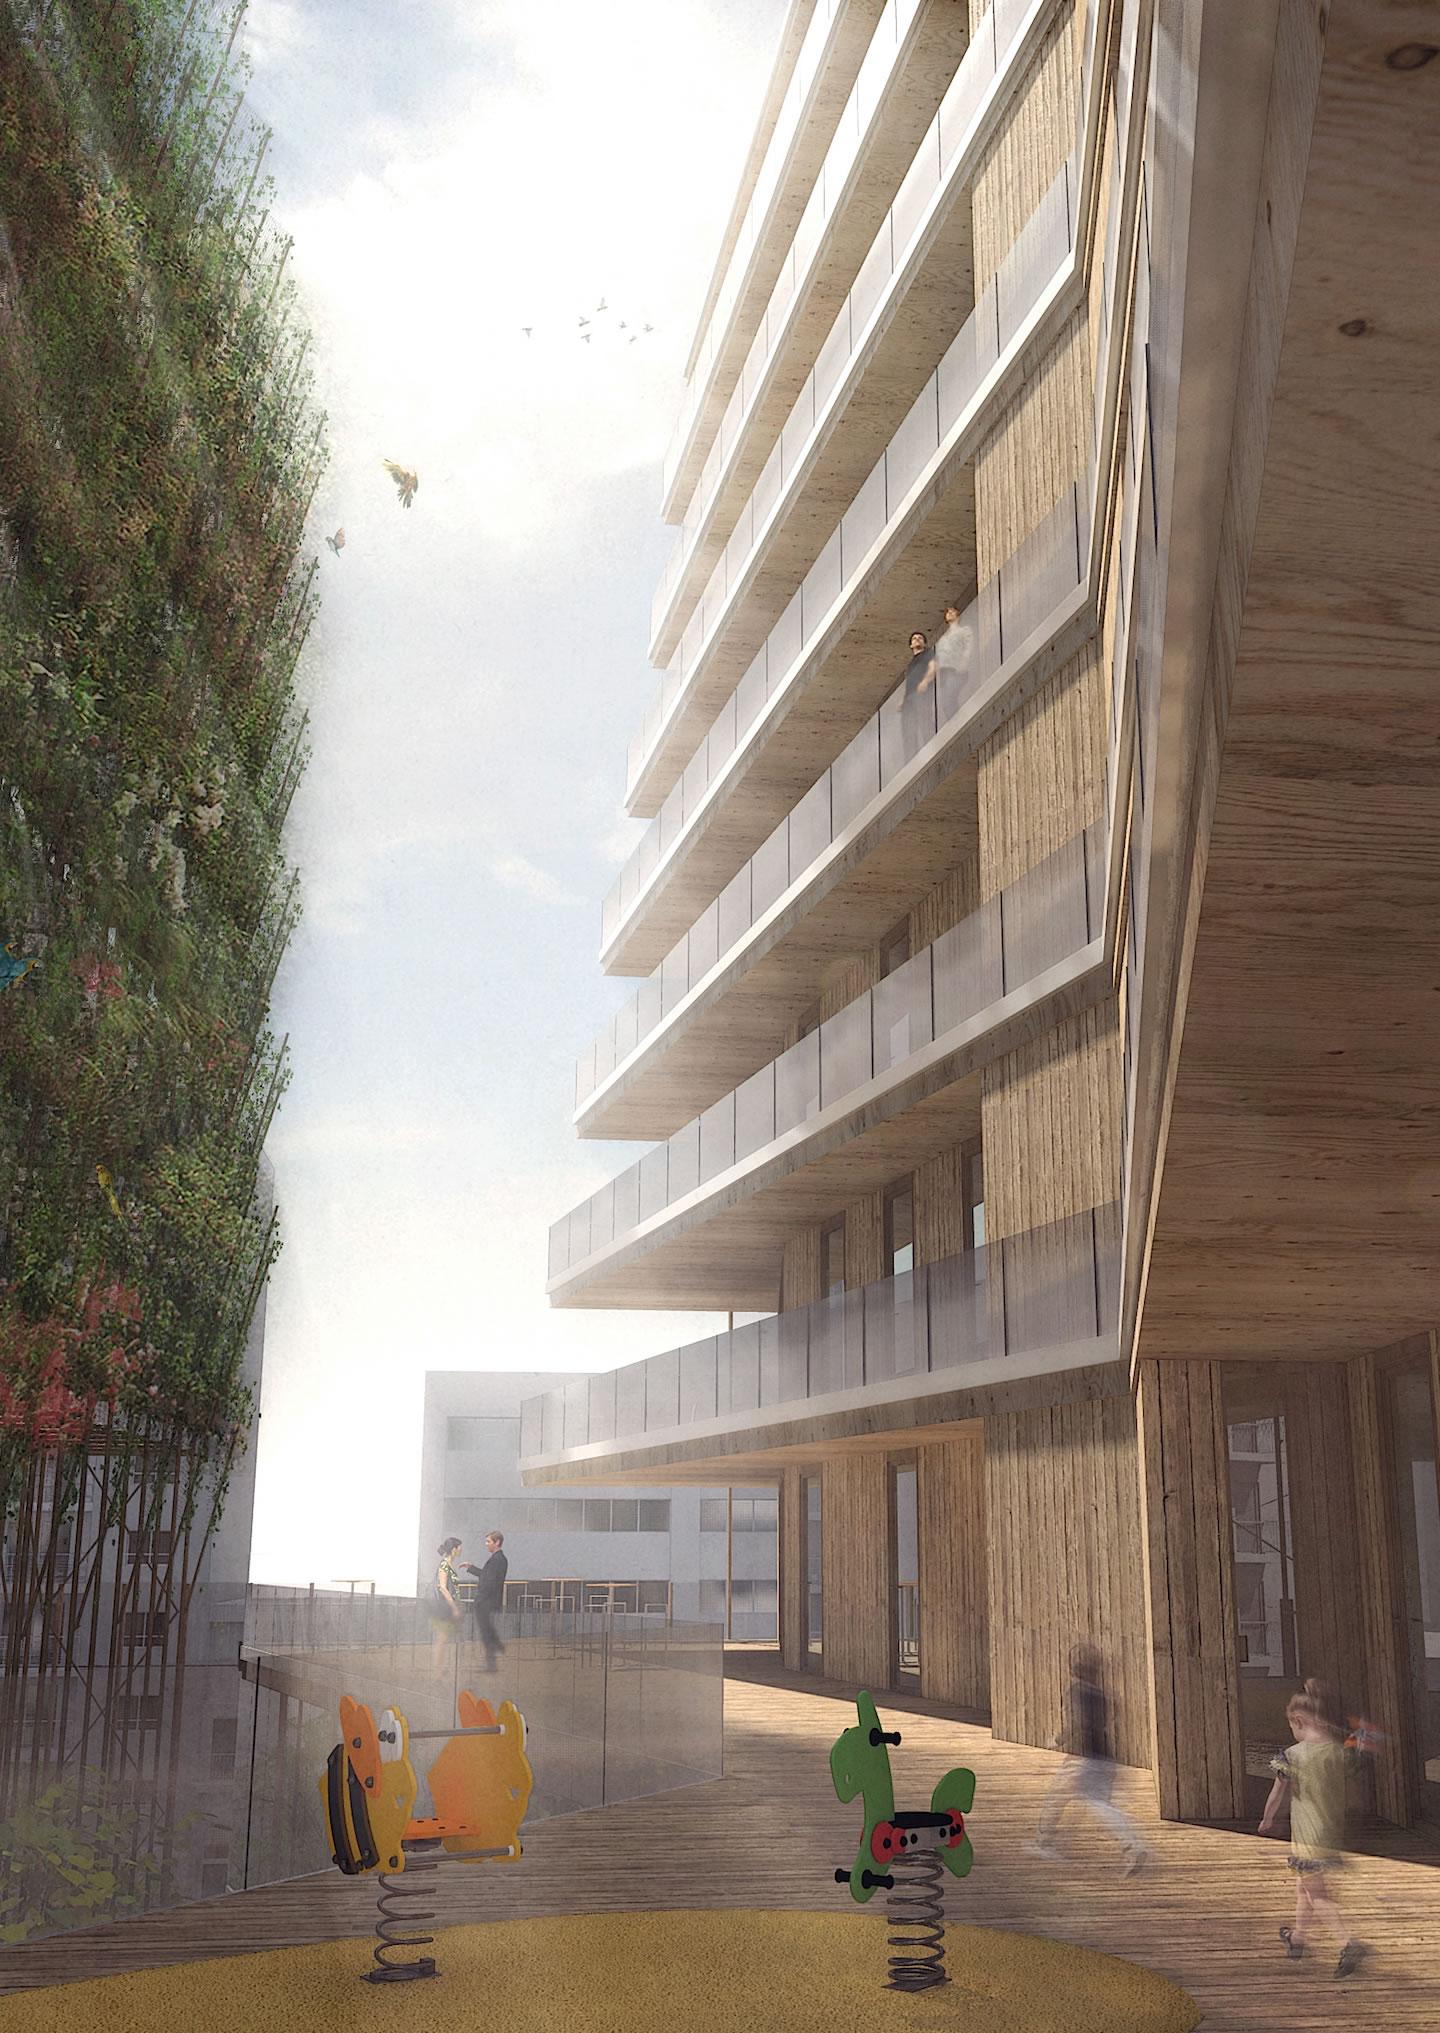 christophe-benichou-architectures-mur-haie-11